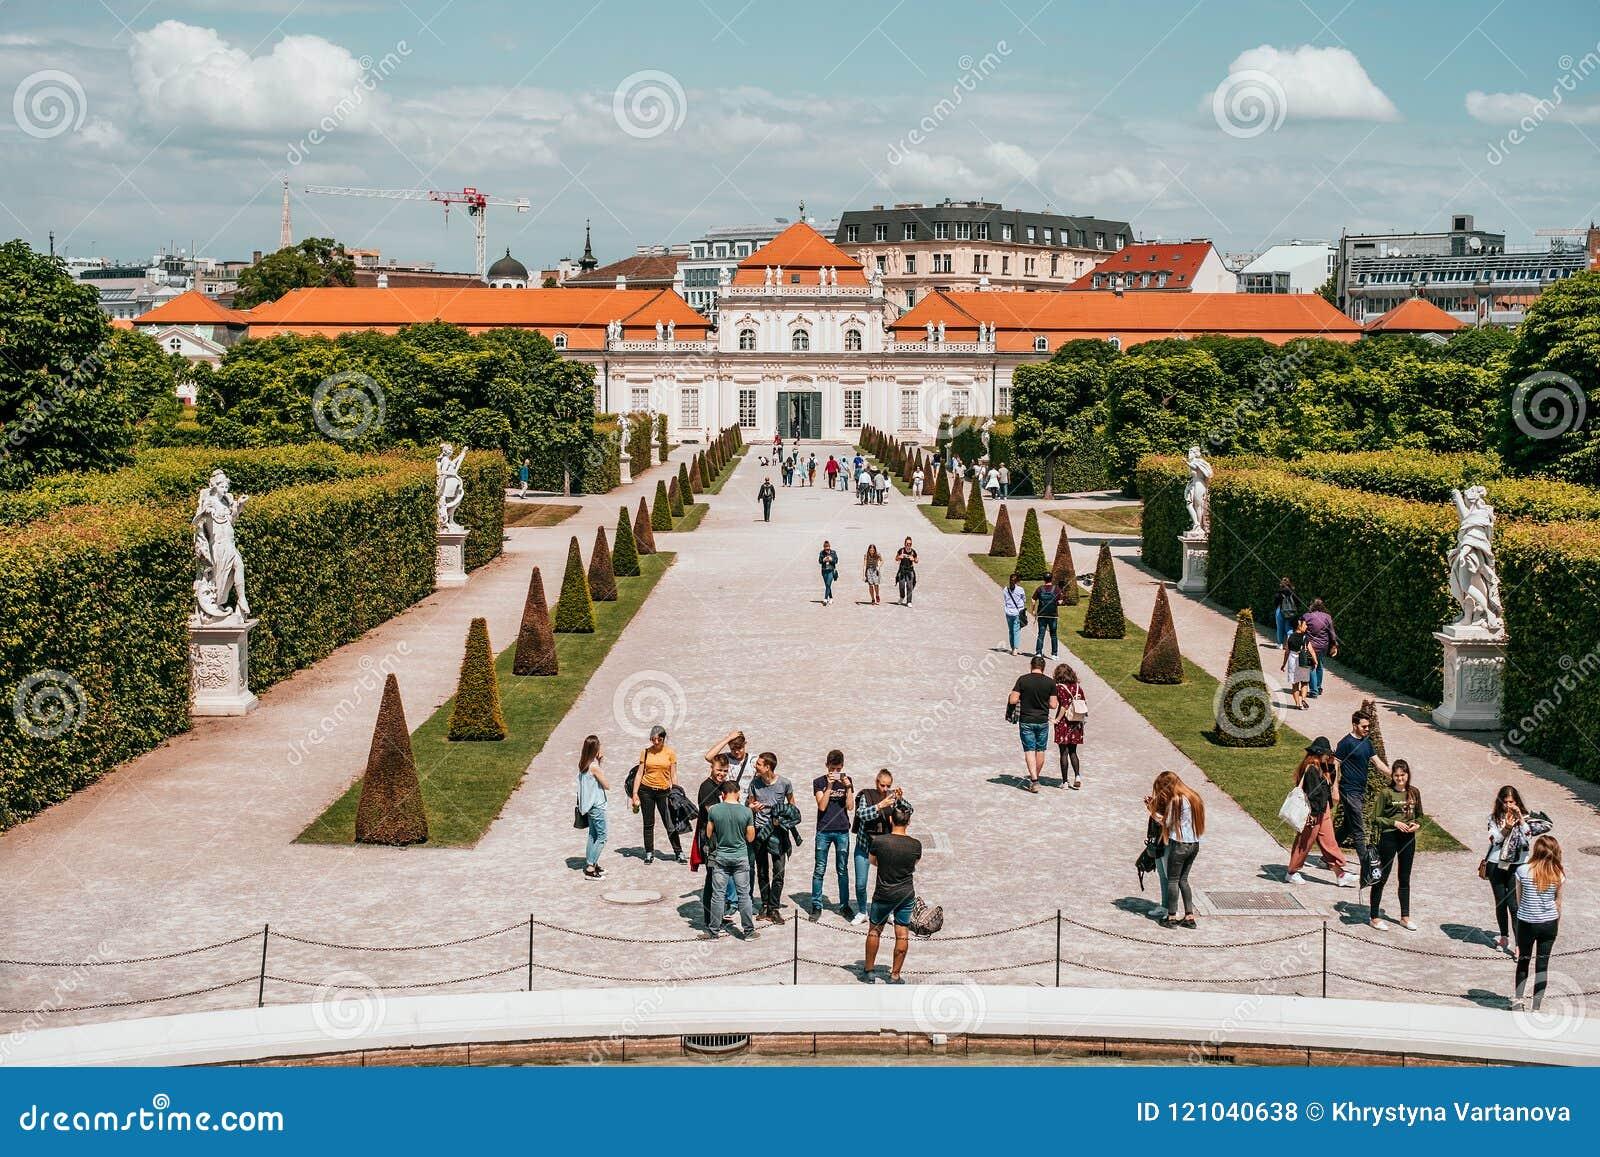 The Lower Belvedere Palace in Vienna, Austria